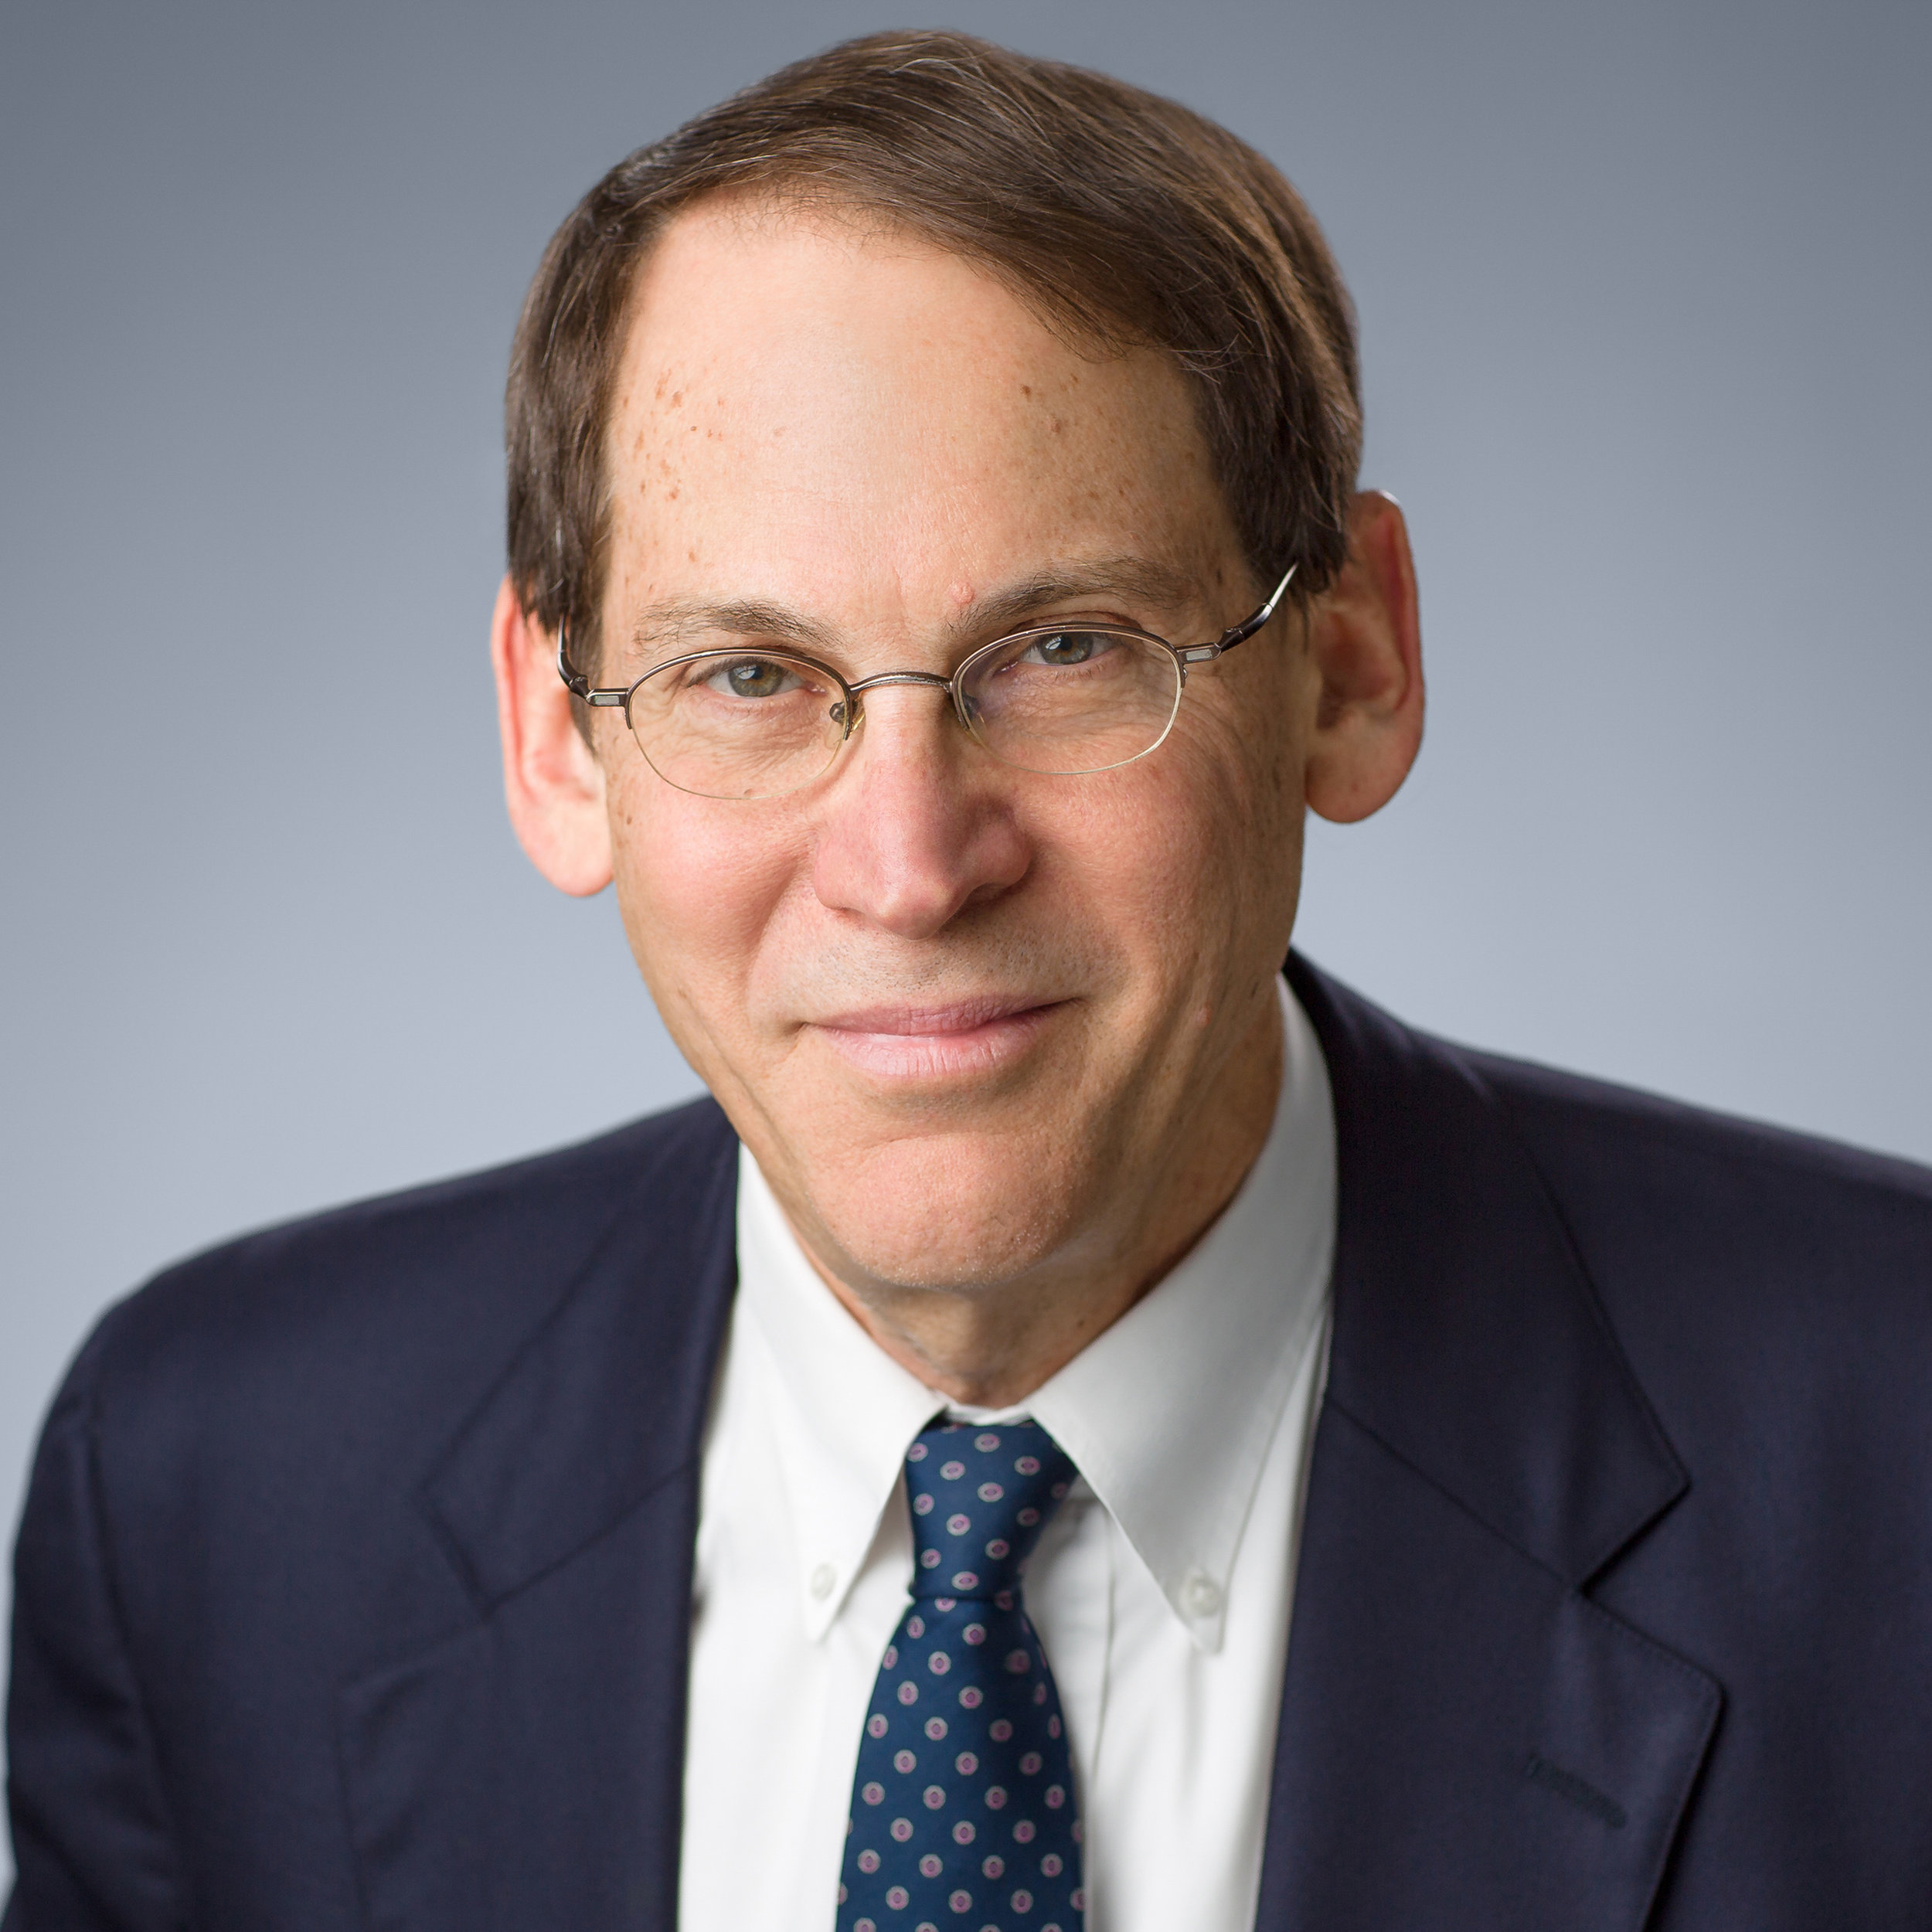 Robert Kleinberg  Senior Research Scholar - Center for Global Energy Policy at Columbia University   Bio